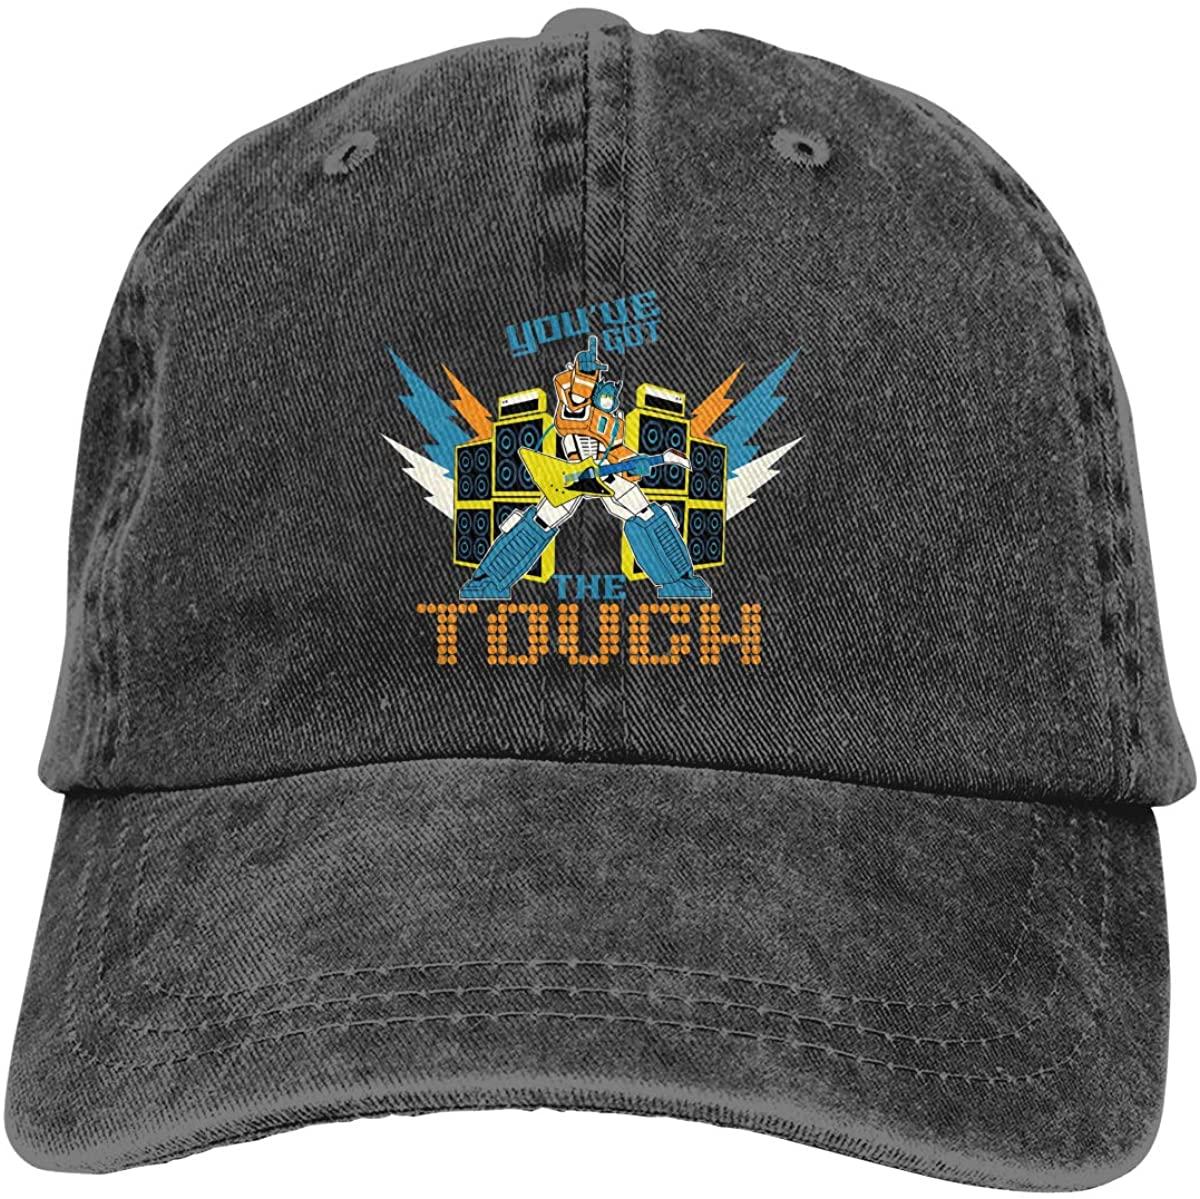 Tlt You've Got The Touch Adjustable Unisex Hat Baseball Caps Black